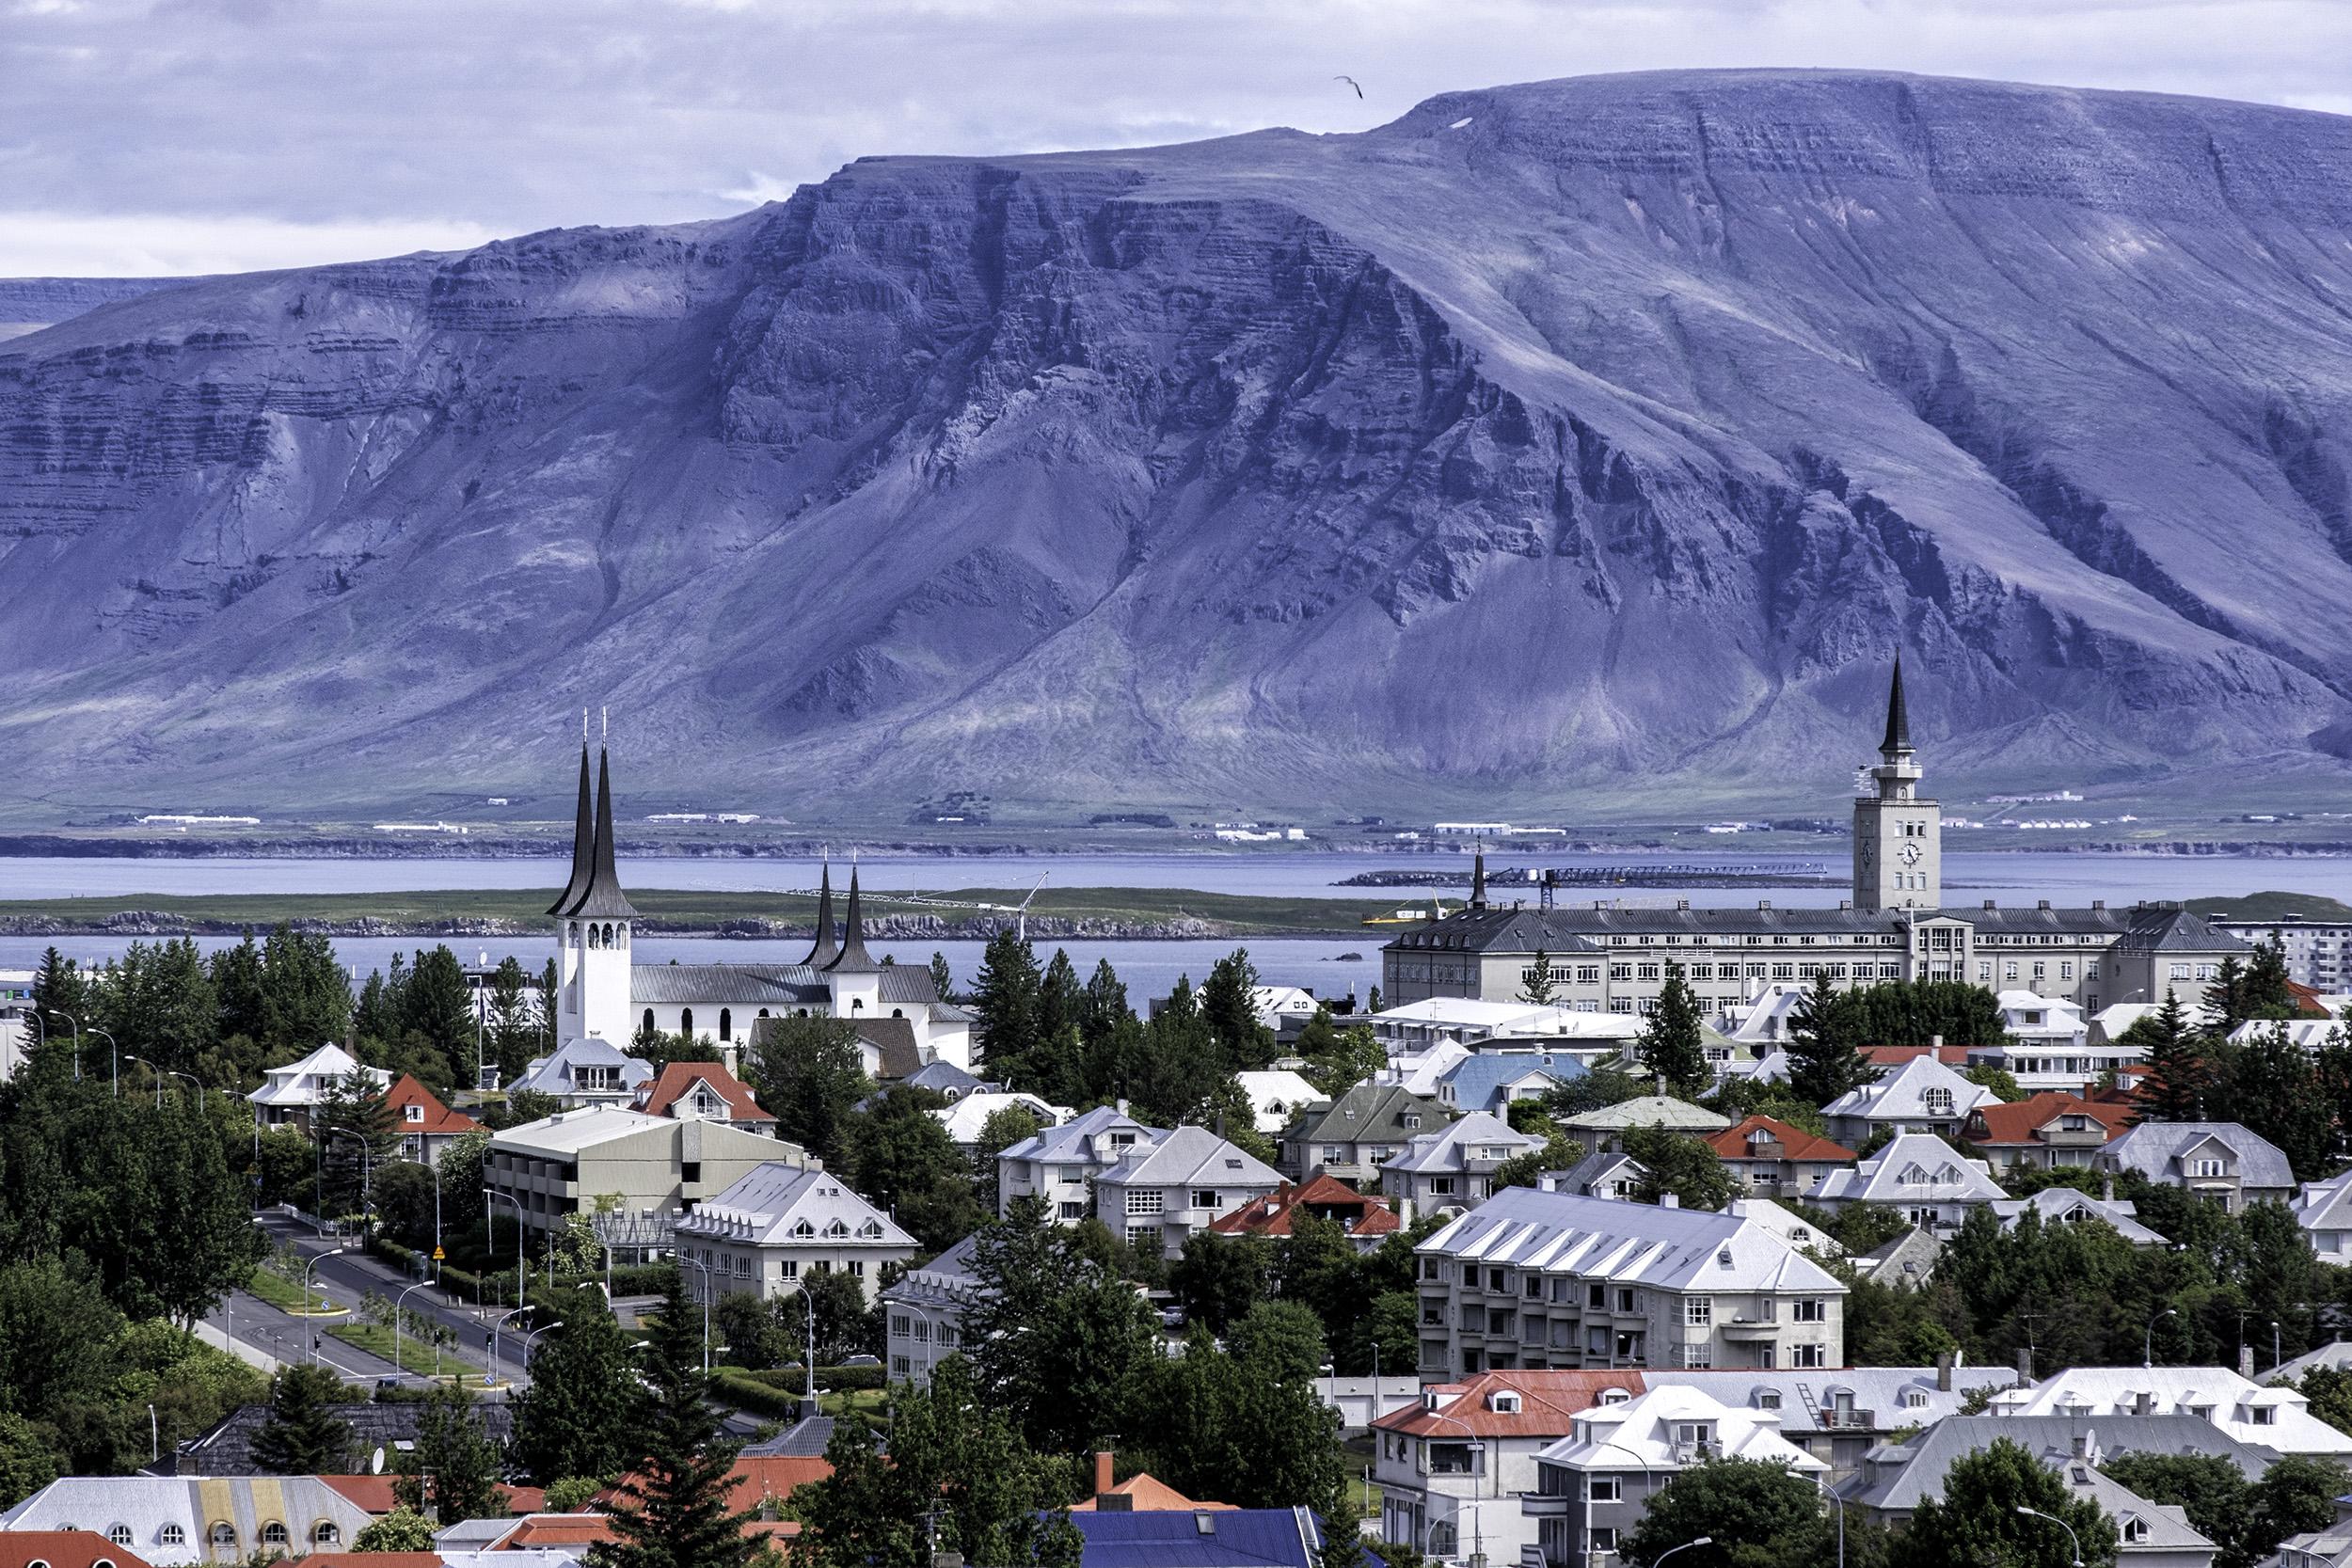 Reykjavik, from the Perlan